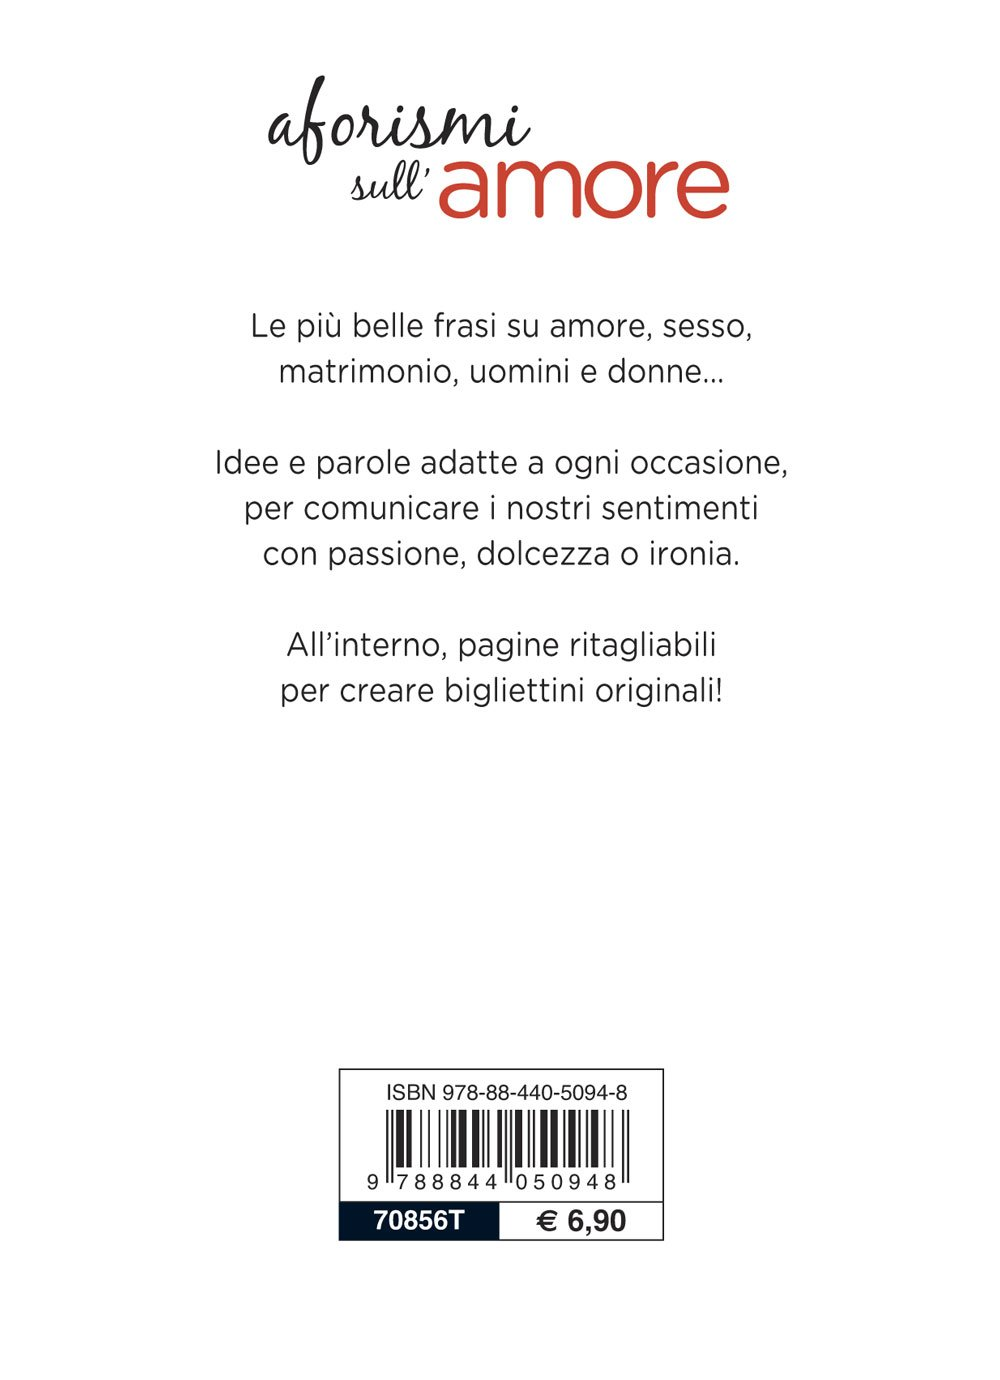 Frasi Sull Amore Per Matrimonio.Aforismi Sull Amore 9788844050948 Amazon Com Books